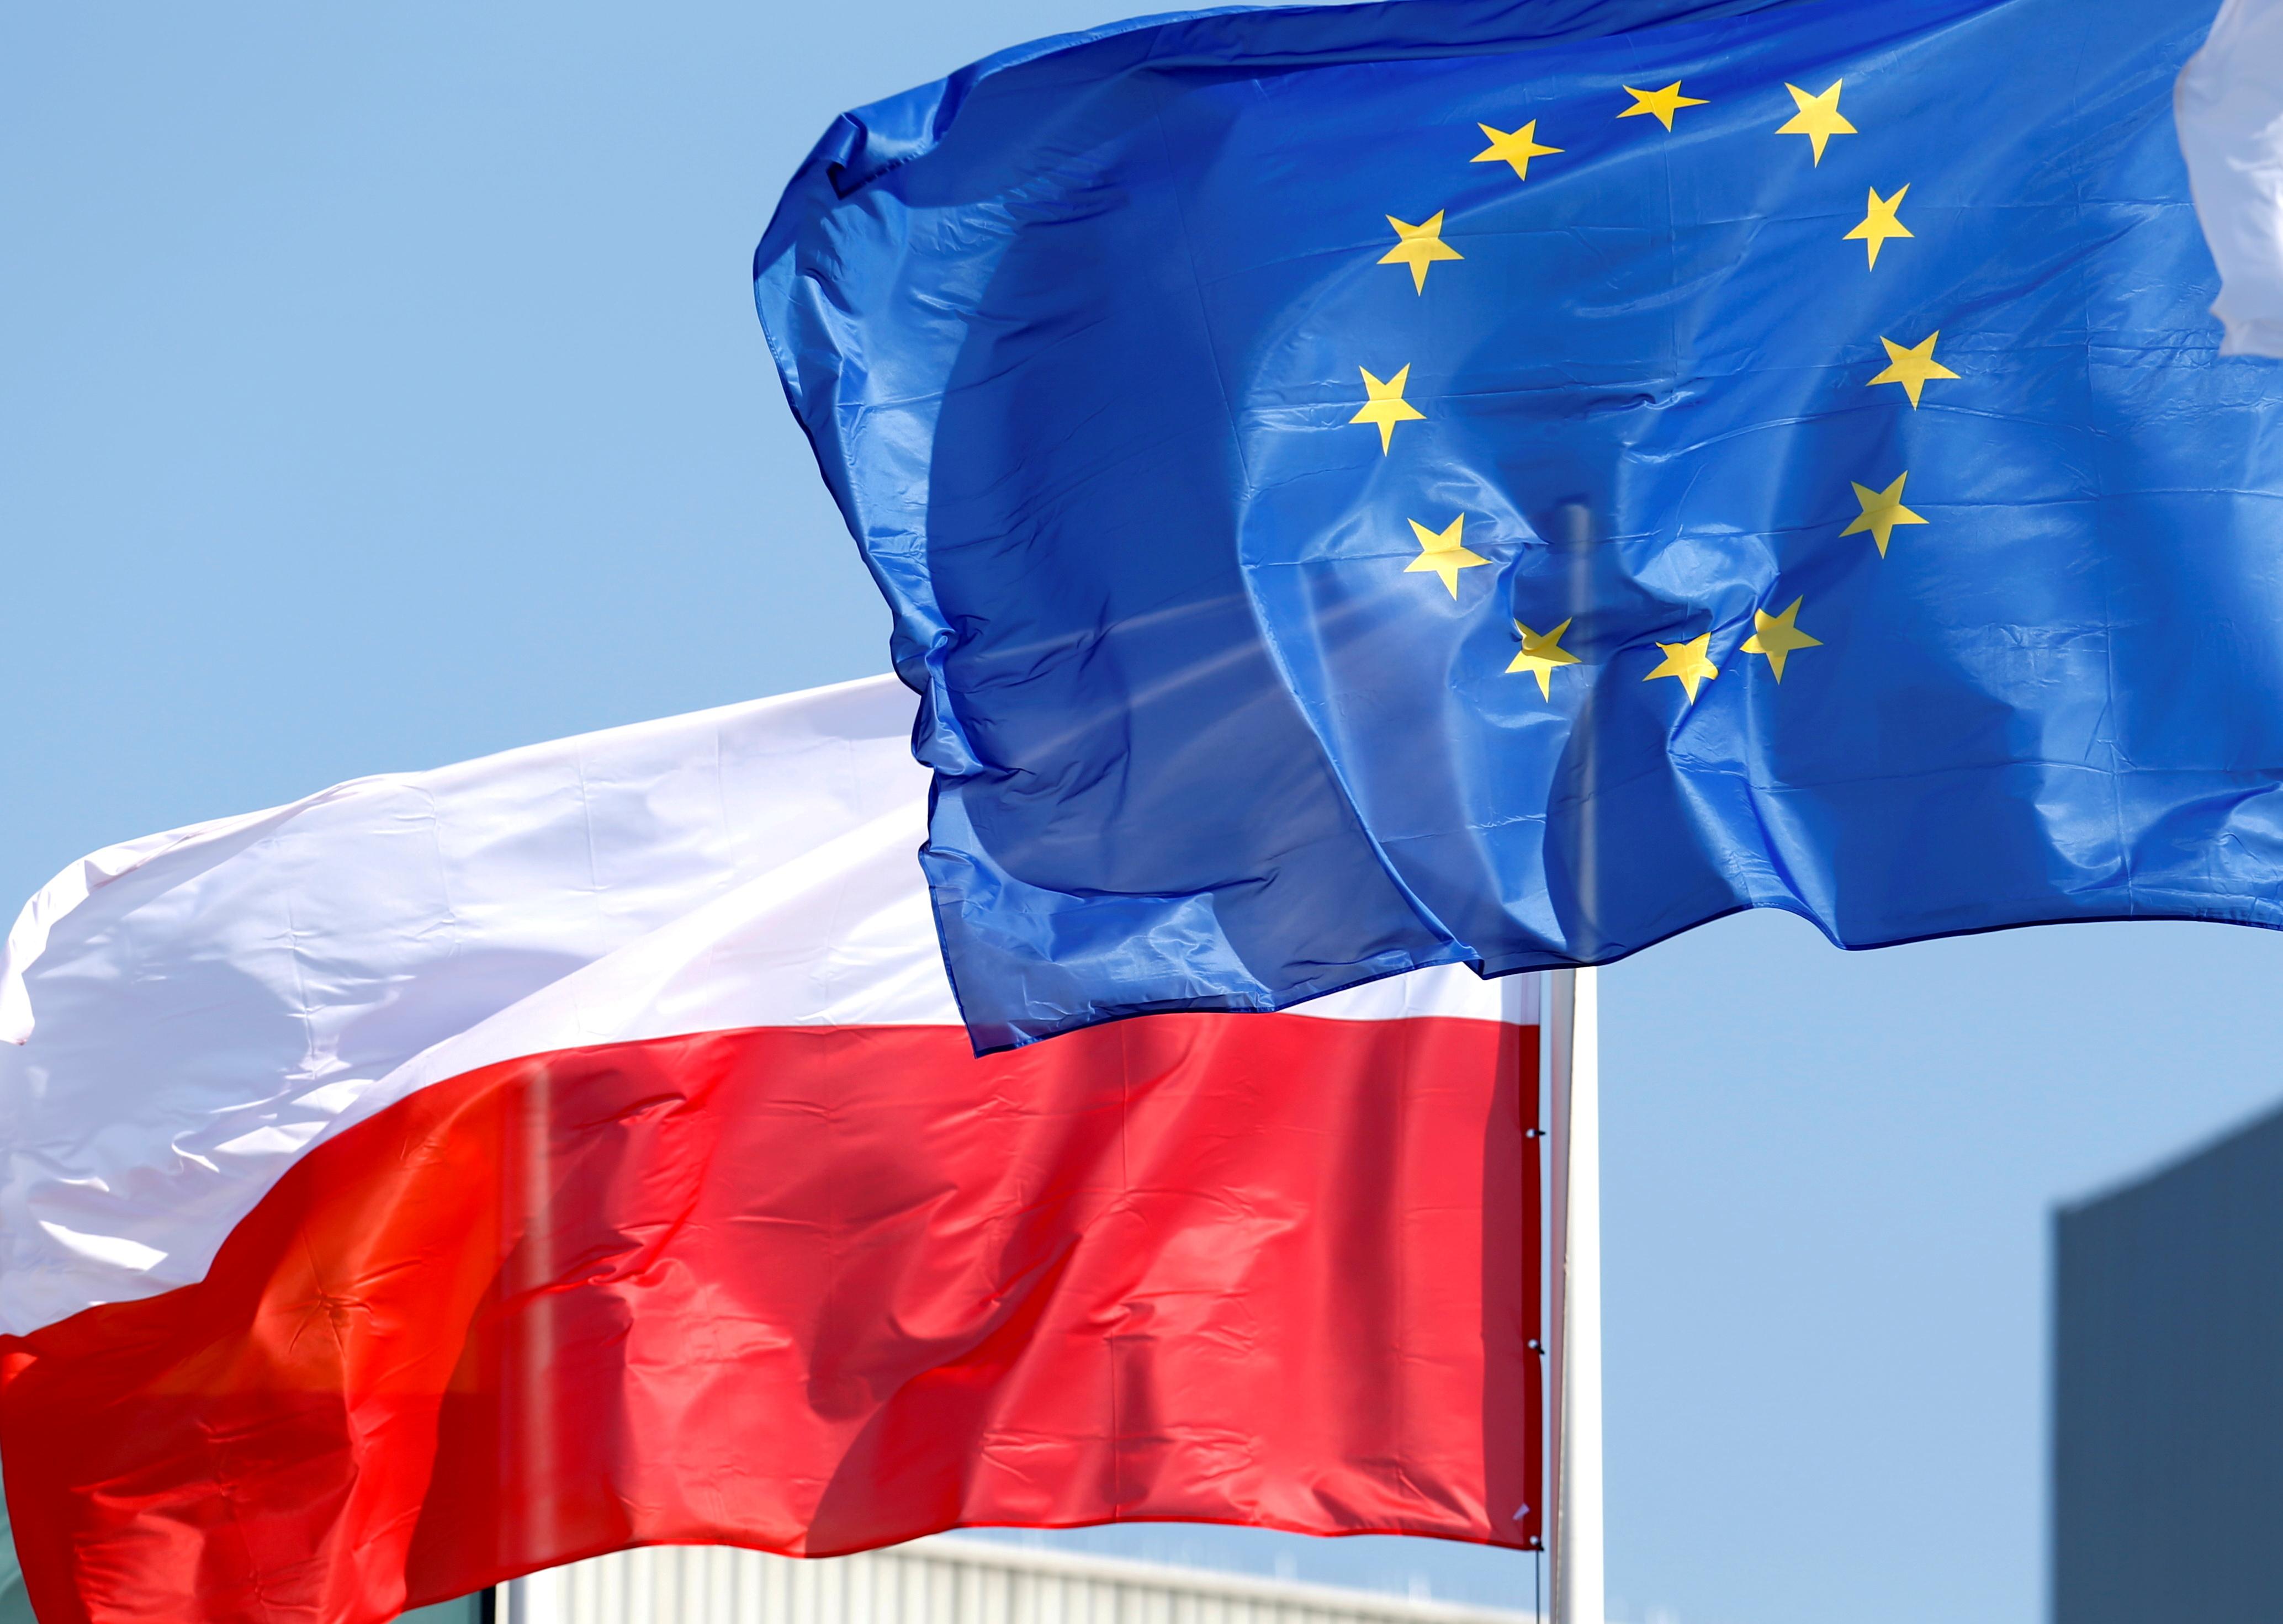 European Union and Polish flags flutter in Mazeikiai, Lithuania April 5, 2019. REUTERS/Ints Kalnins